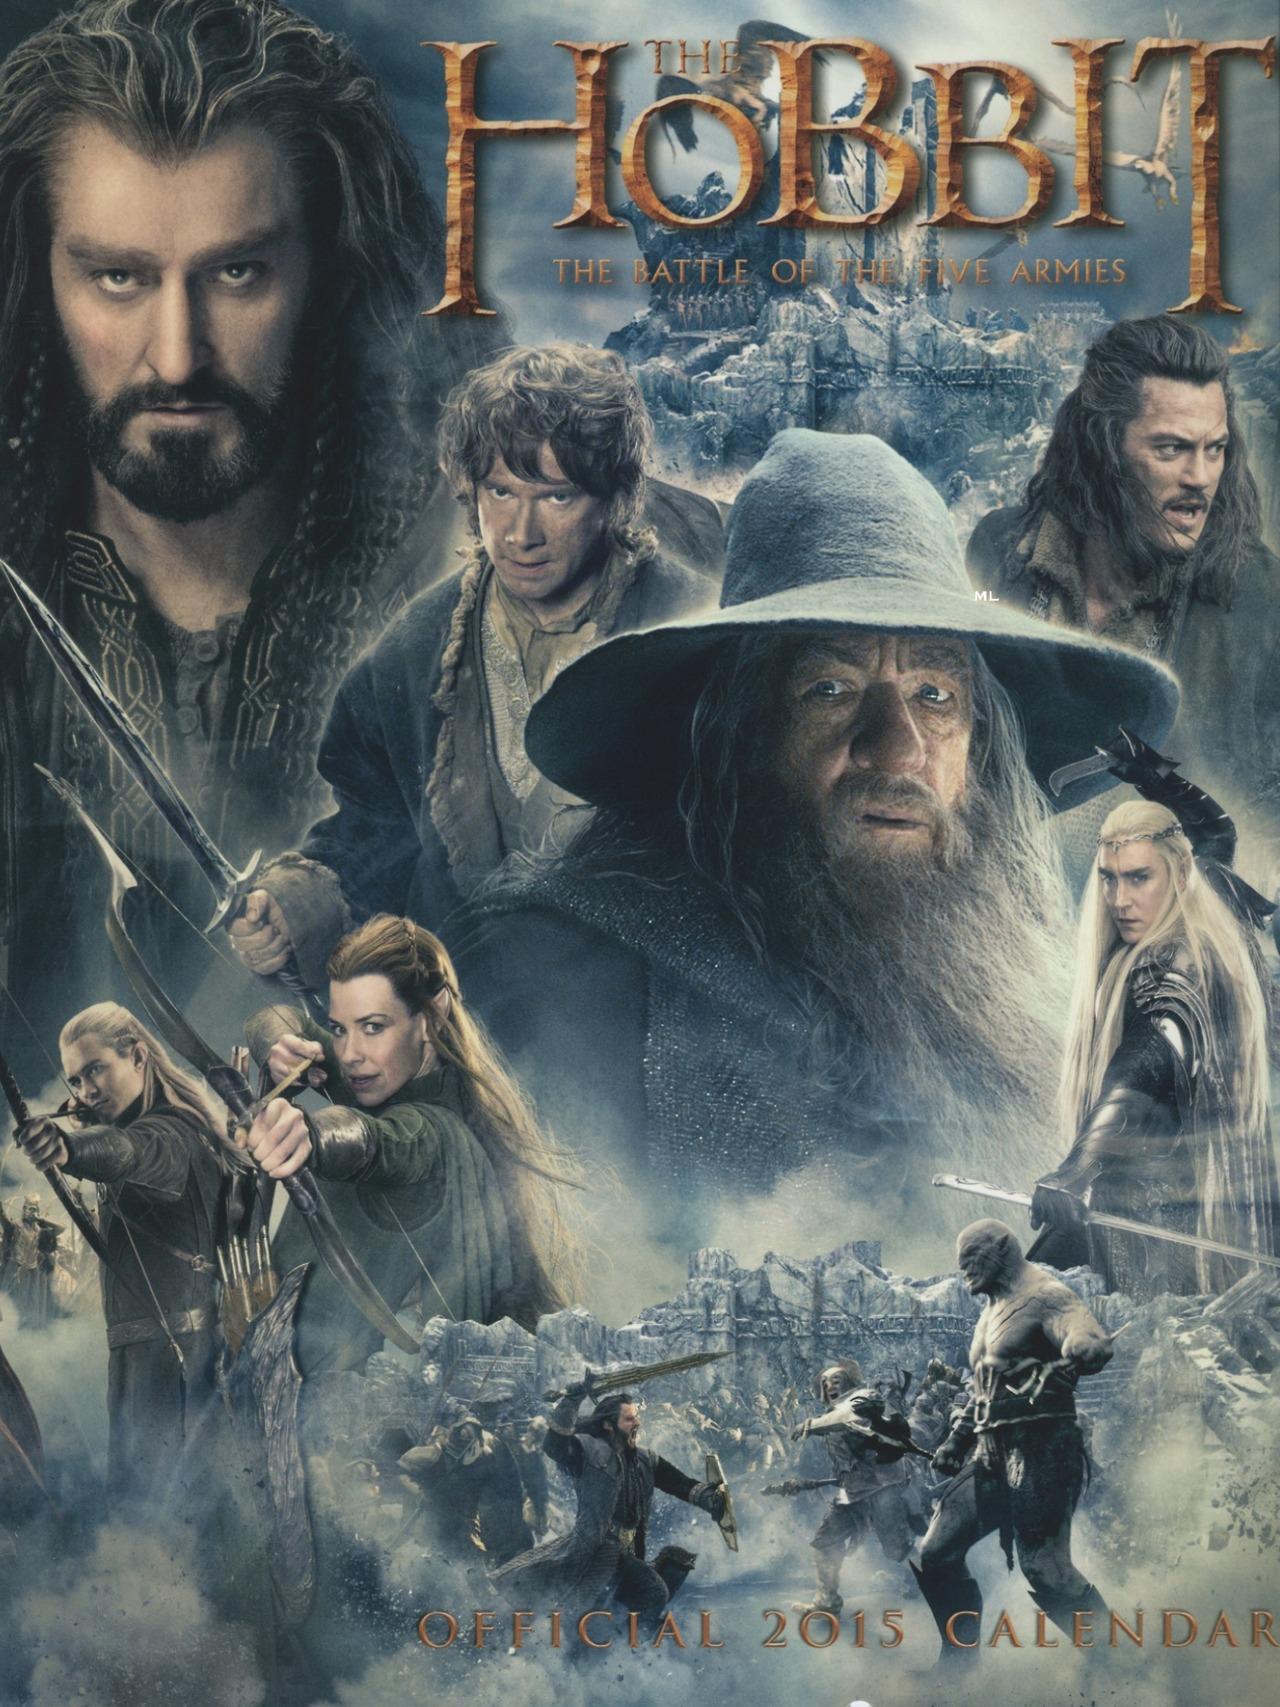 The Hobbit Battle Of Five Armies A Review St Albans Literary